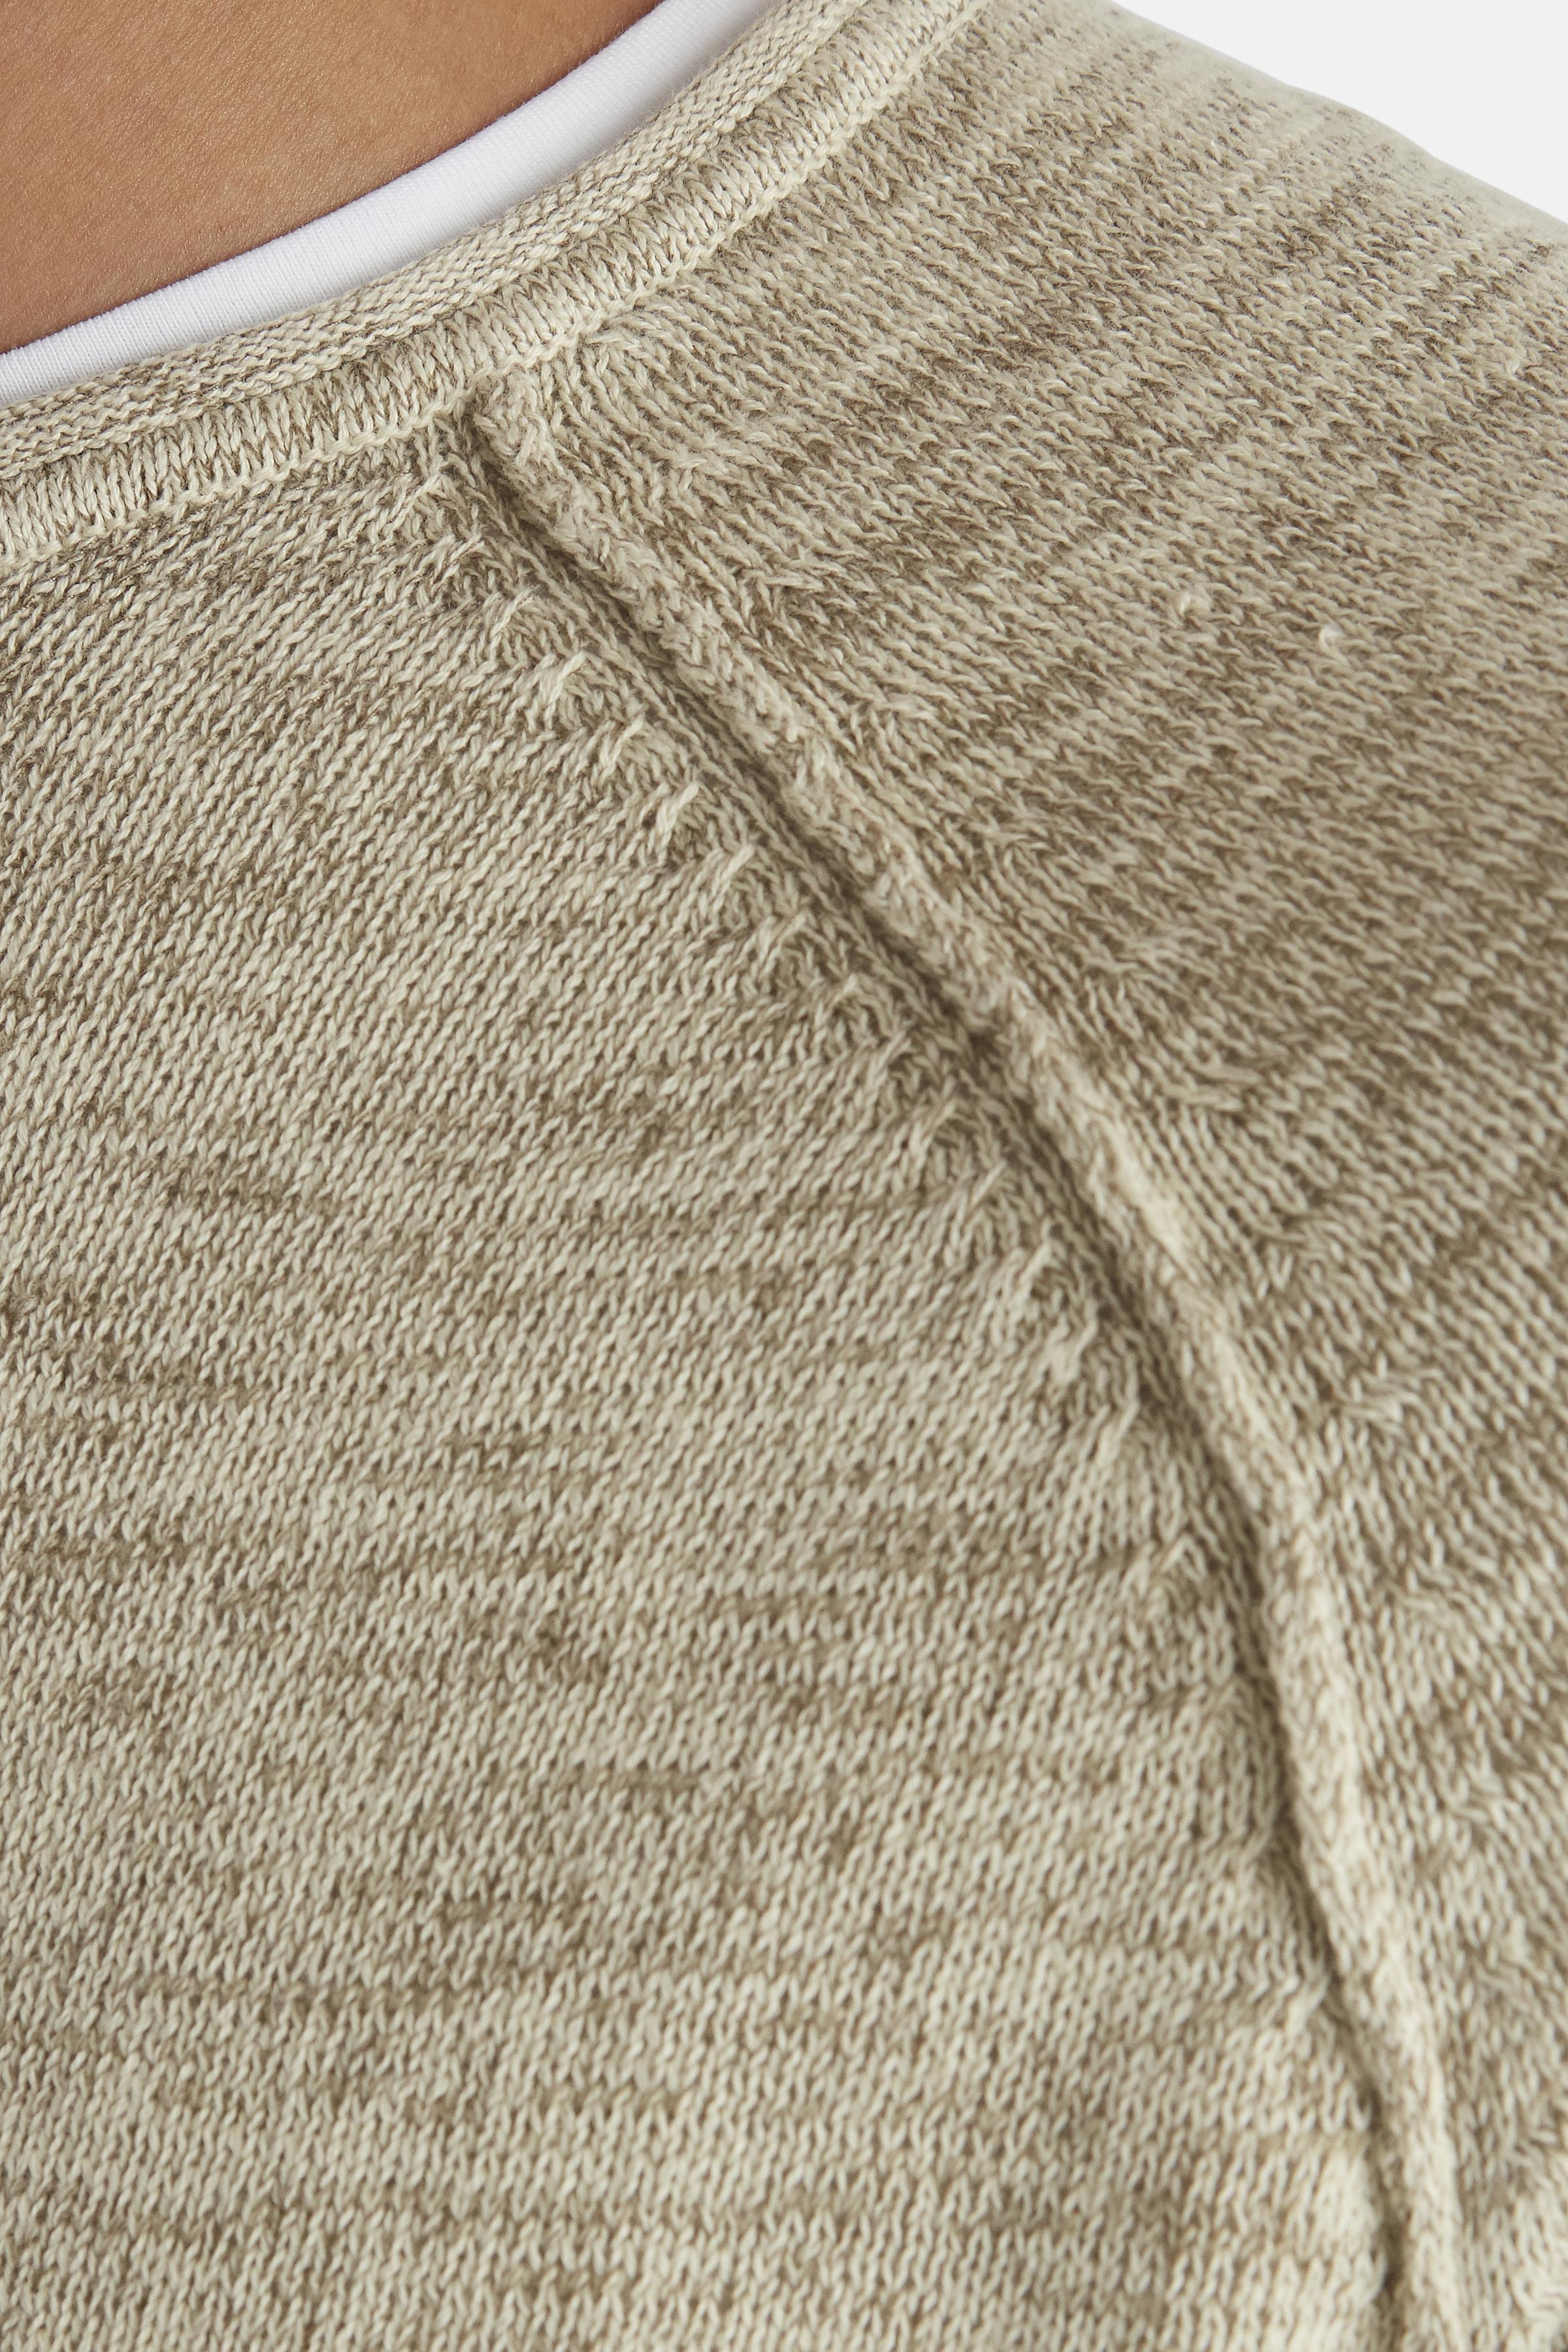 Bone white Strikpullover – Køb Bone white Strikpullover fra str. S-XXL her